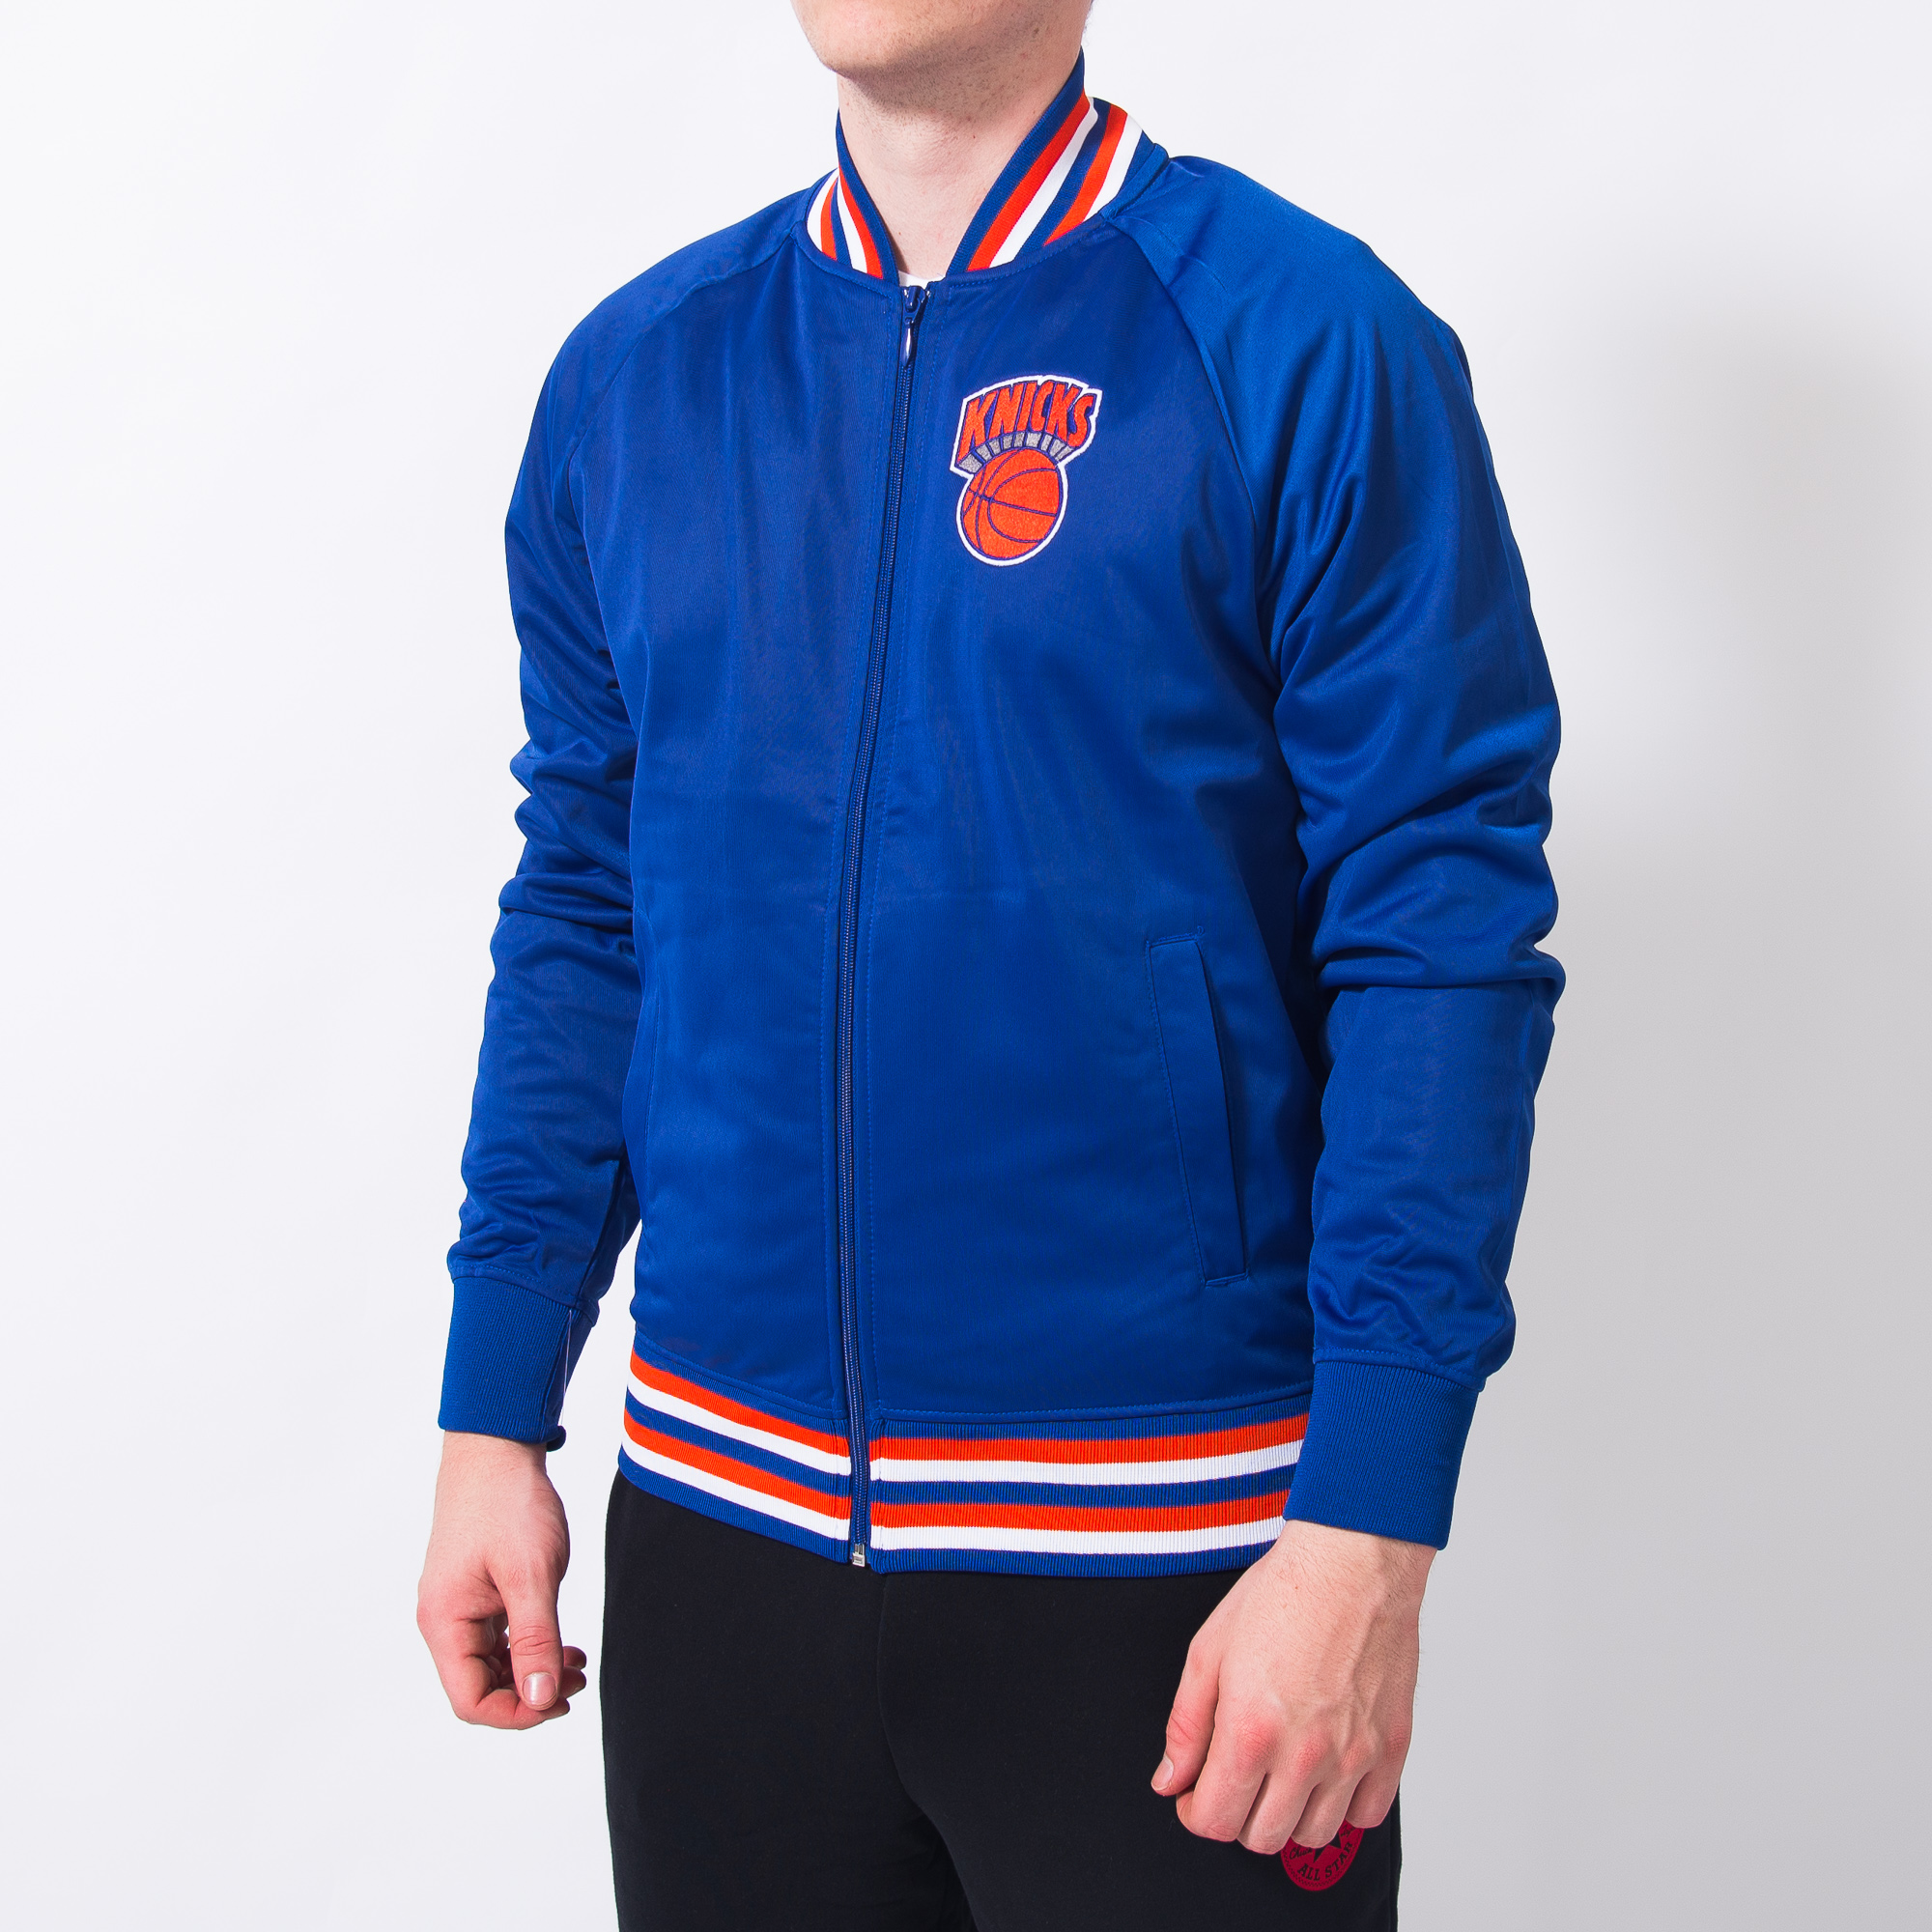 d9bf3ee3ff Mitchell & Ness NBA New York Knicks Top Prospect Jacket - NBA Shop ...